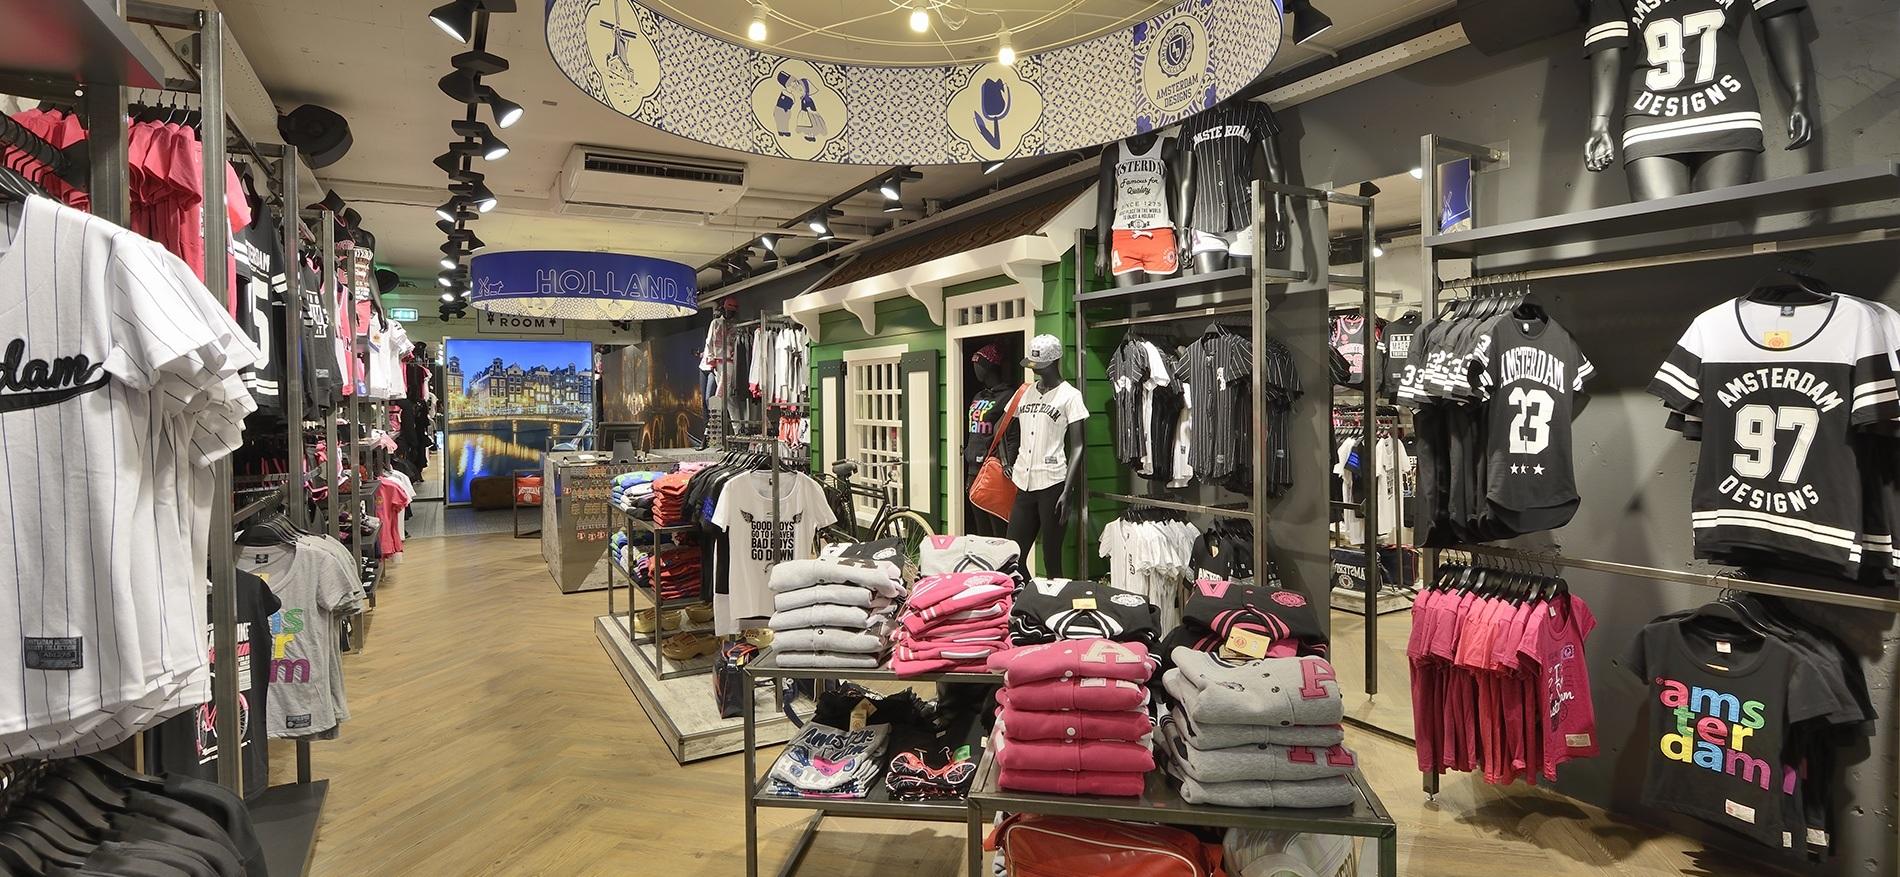 Persbericht winkelinrichting kledingwinkel beleving 3 0 for Interieur winkel amsterdam